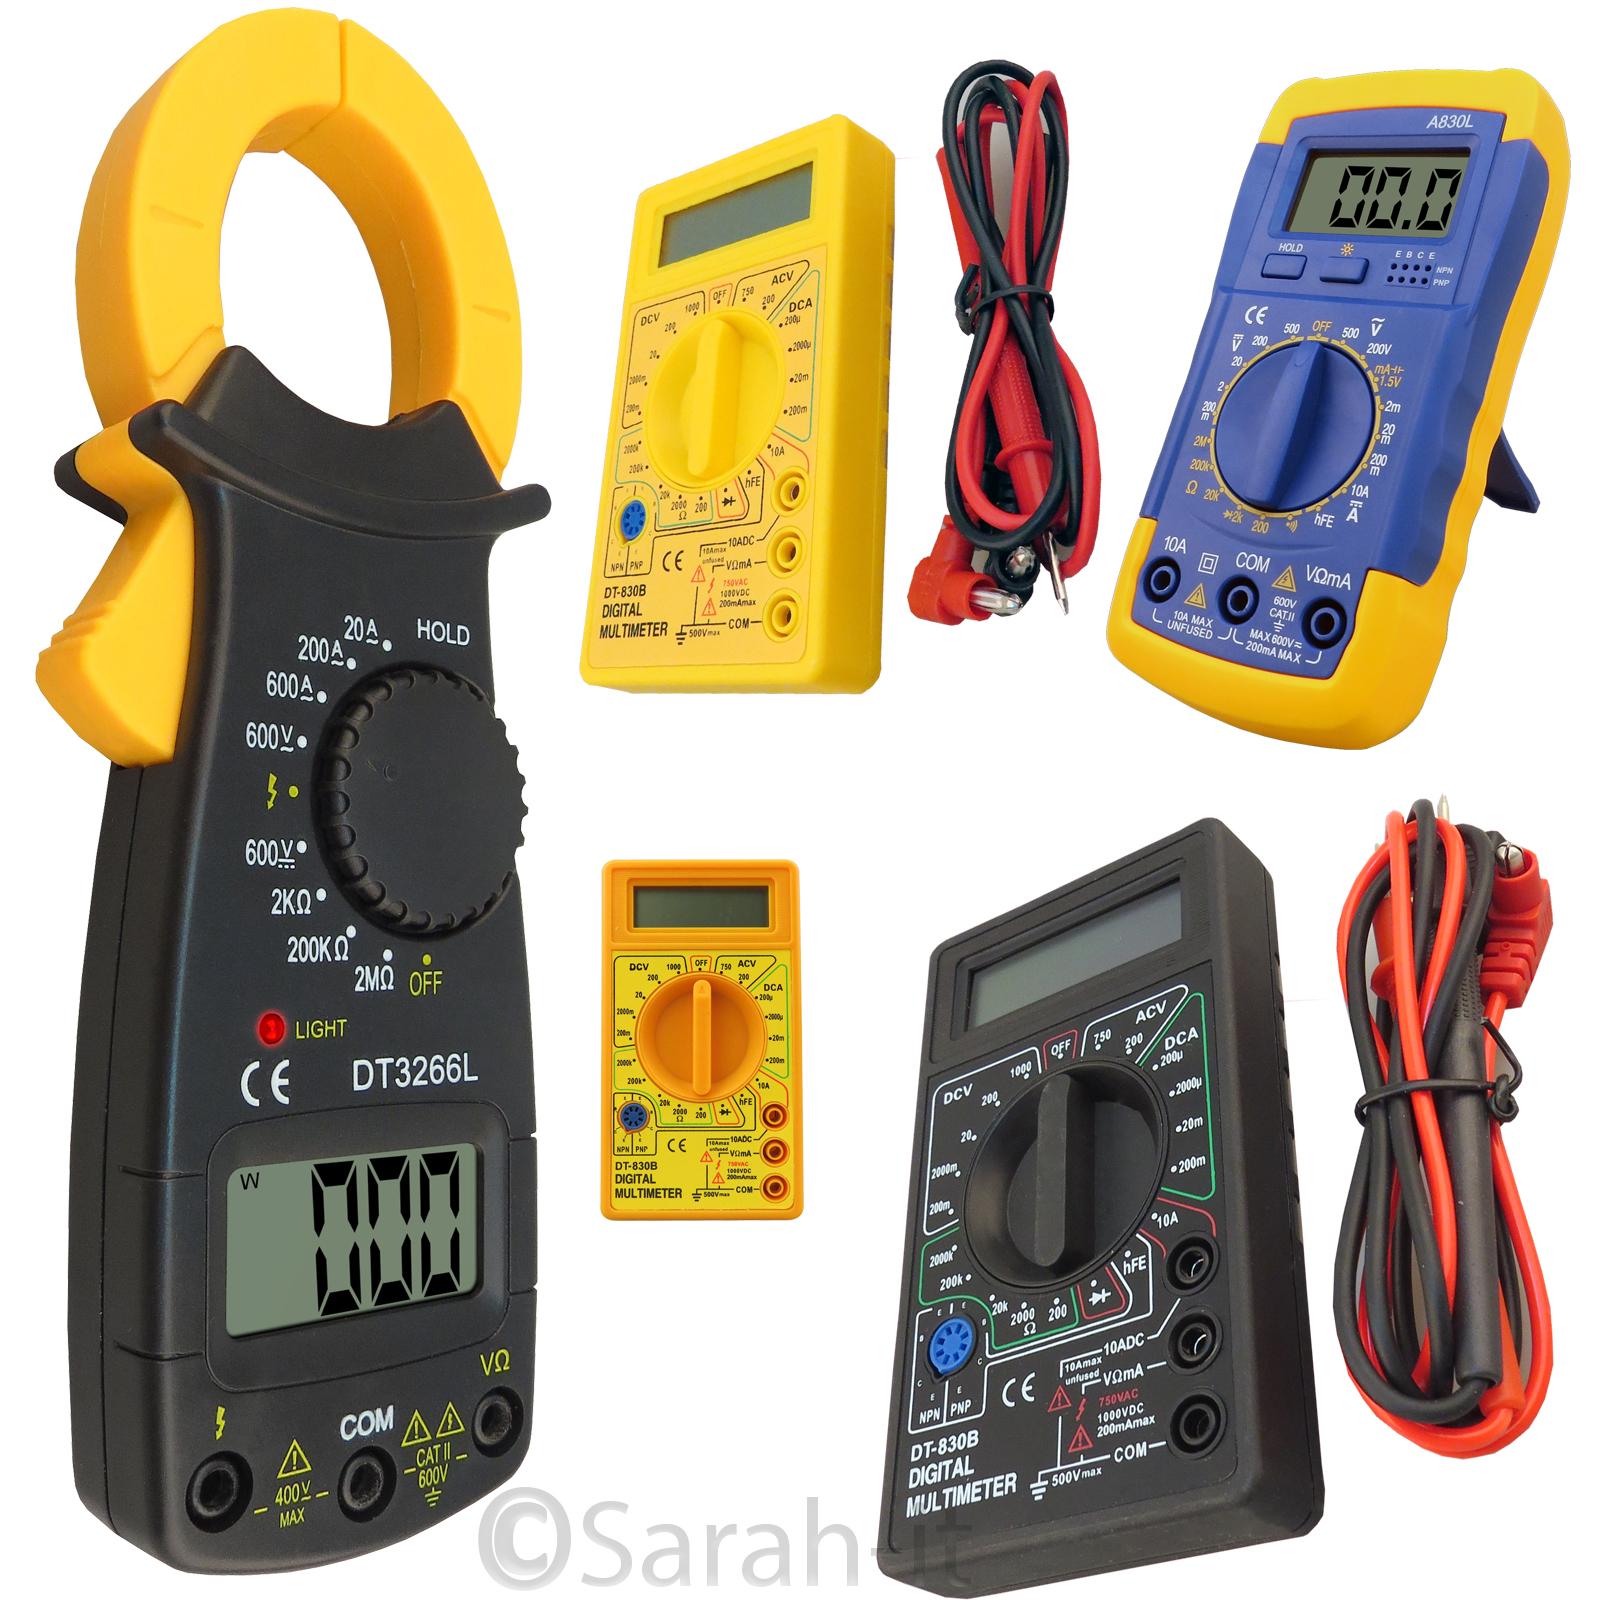 Ac Circuit Testers : Digital lcd multimeter ohm voltmeter ac dc circuit tester